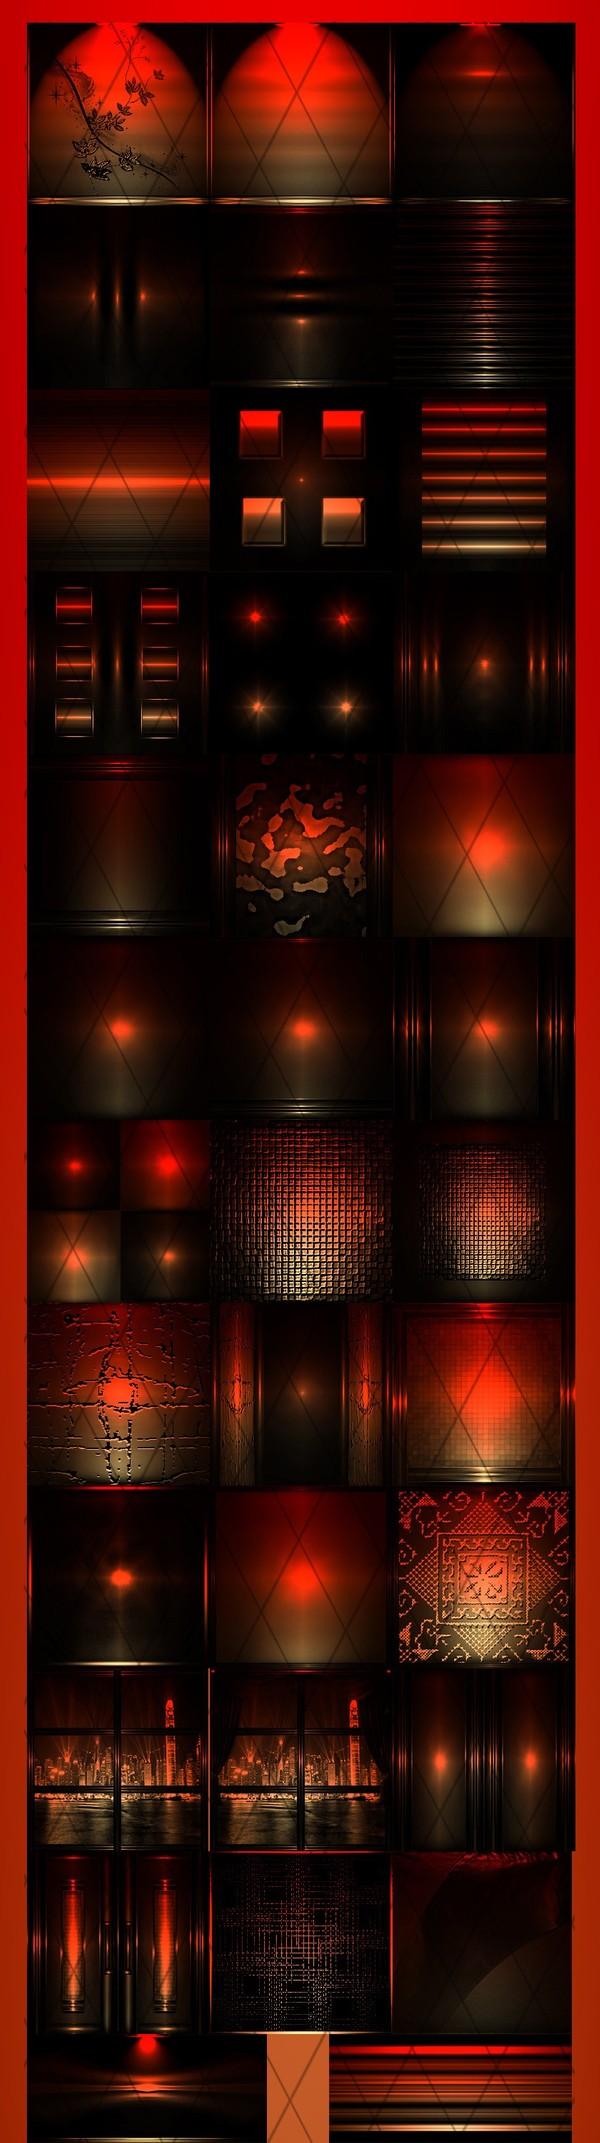 FOCUS RED FILES 35Textures 256x256jpg.